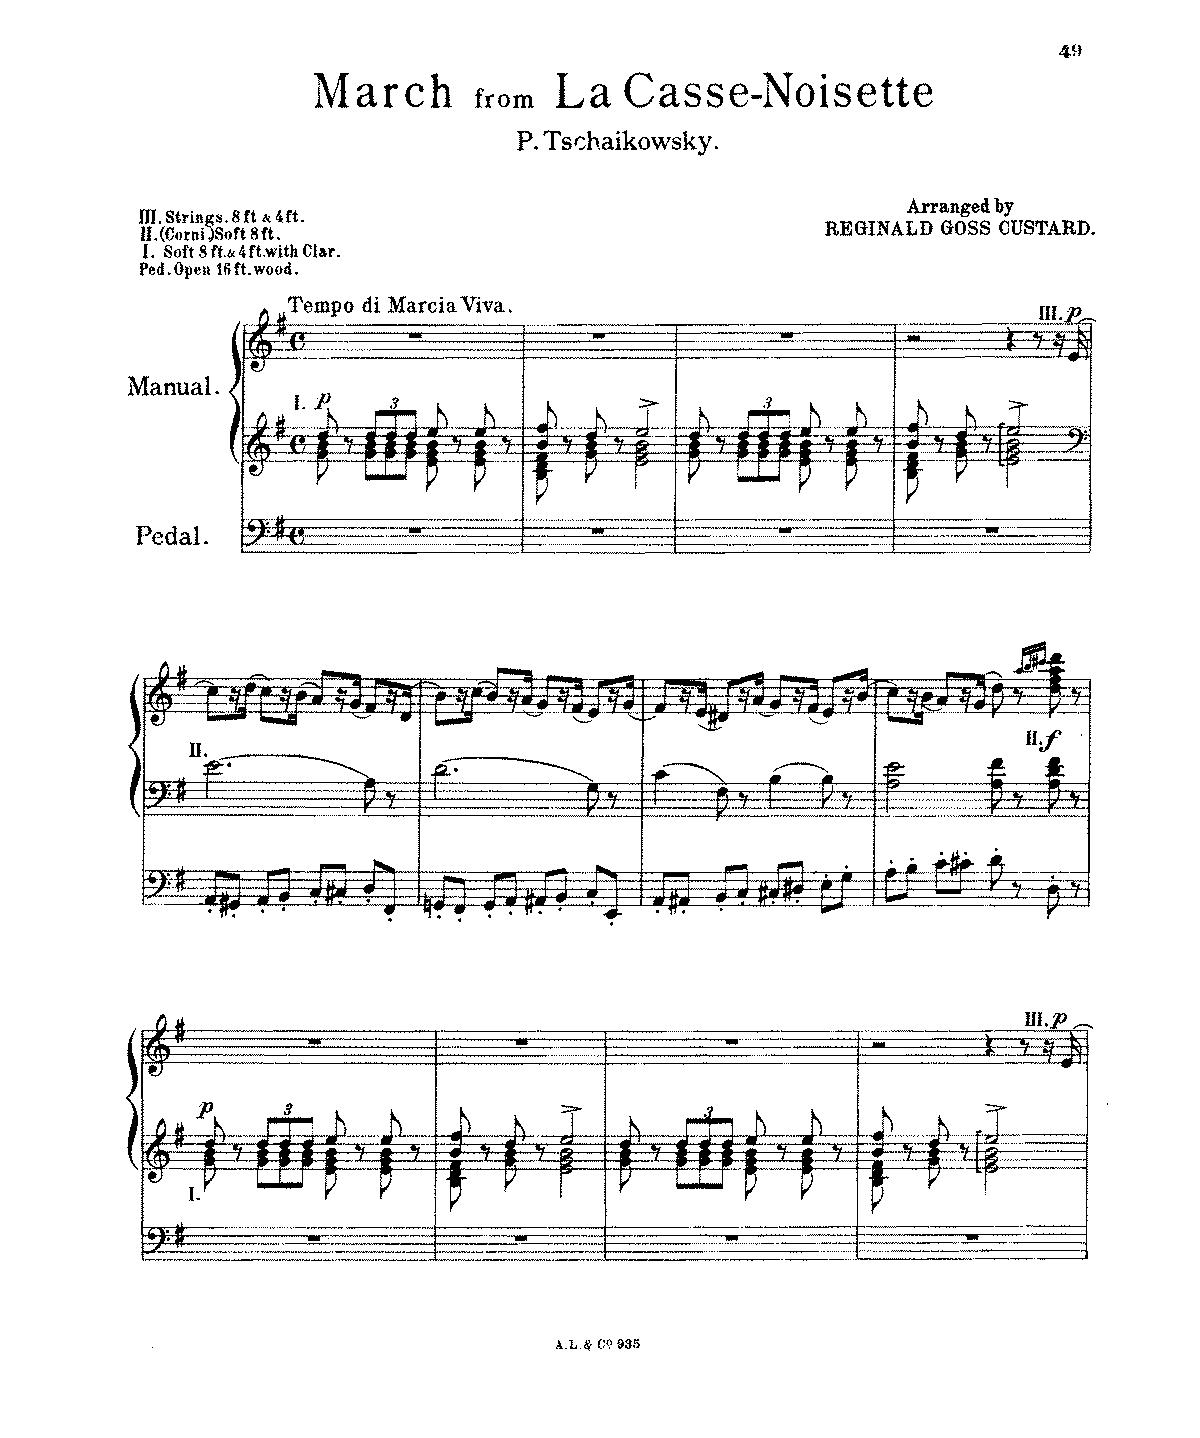 Free Sheet Music Public Domain: The Nutcracker (ballet), Op.71 (Tchaikovsky, Pyotr